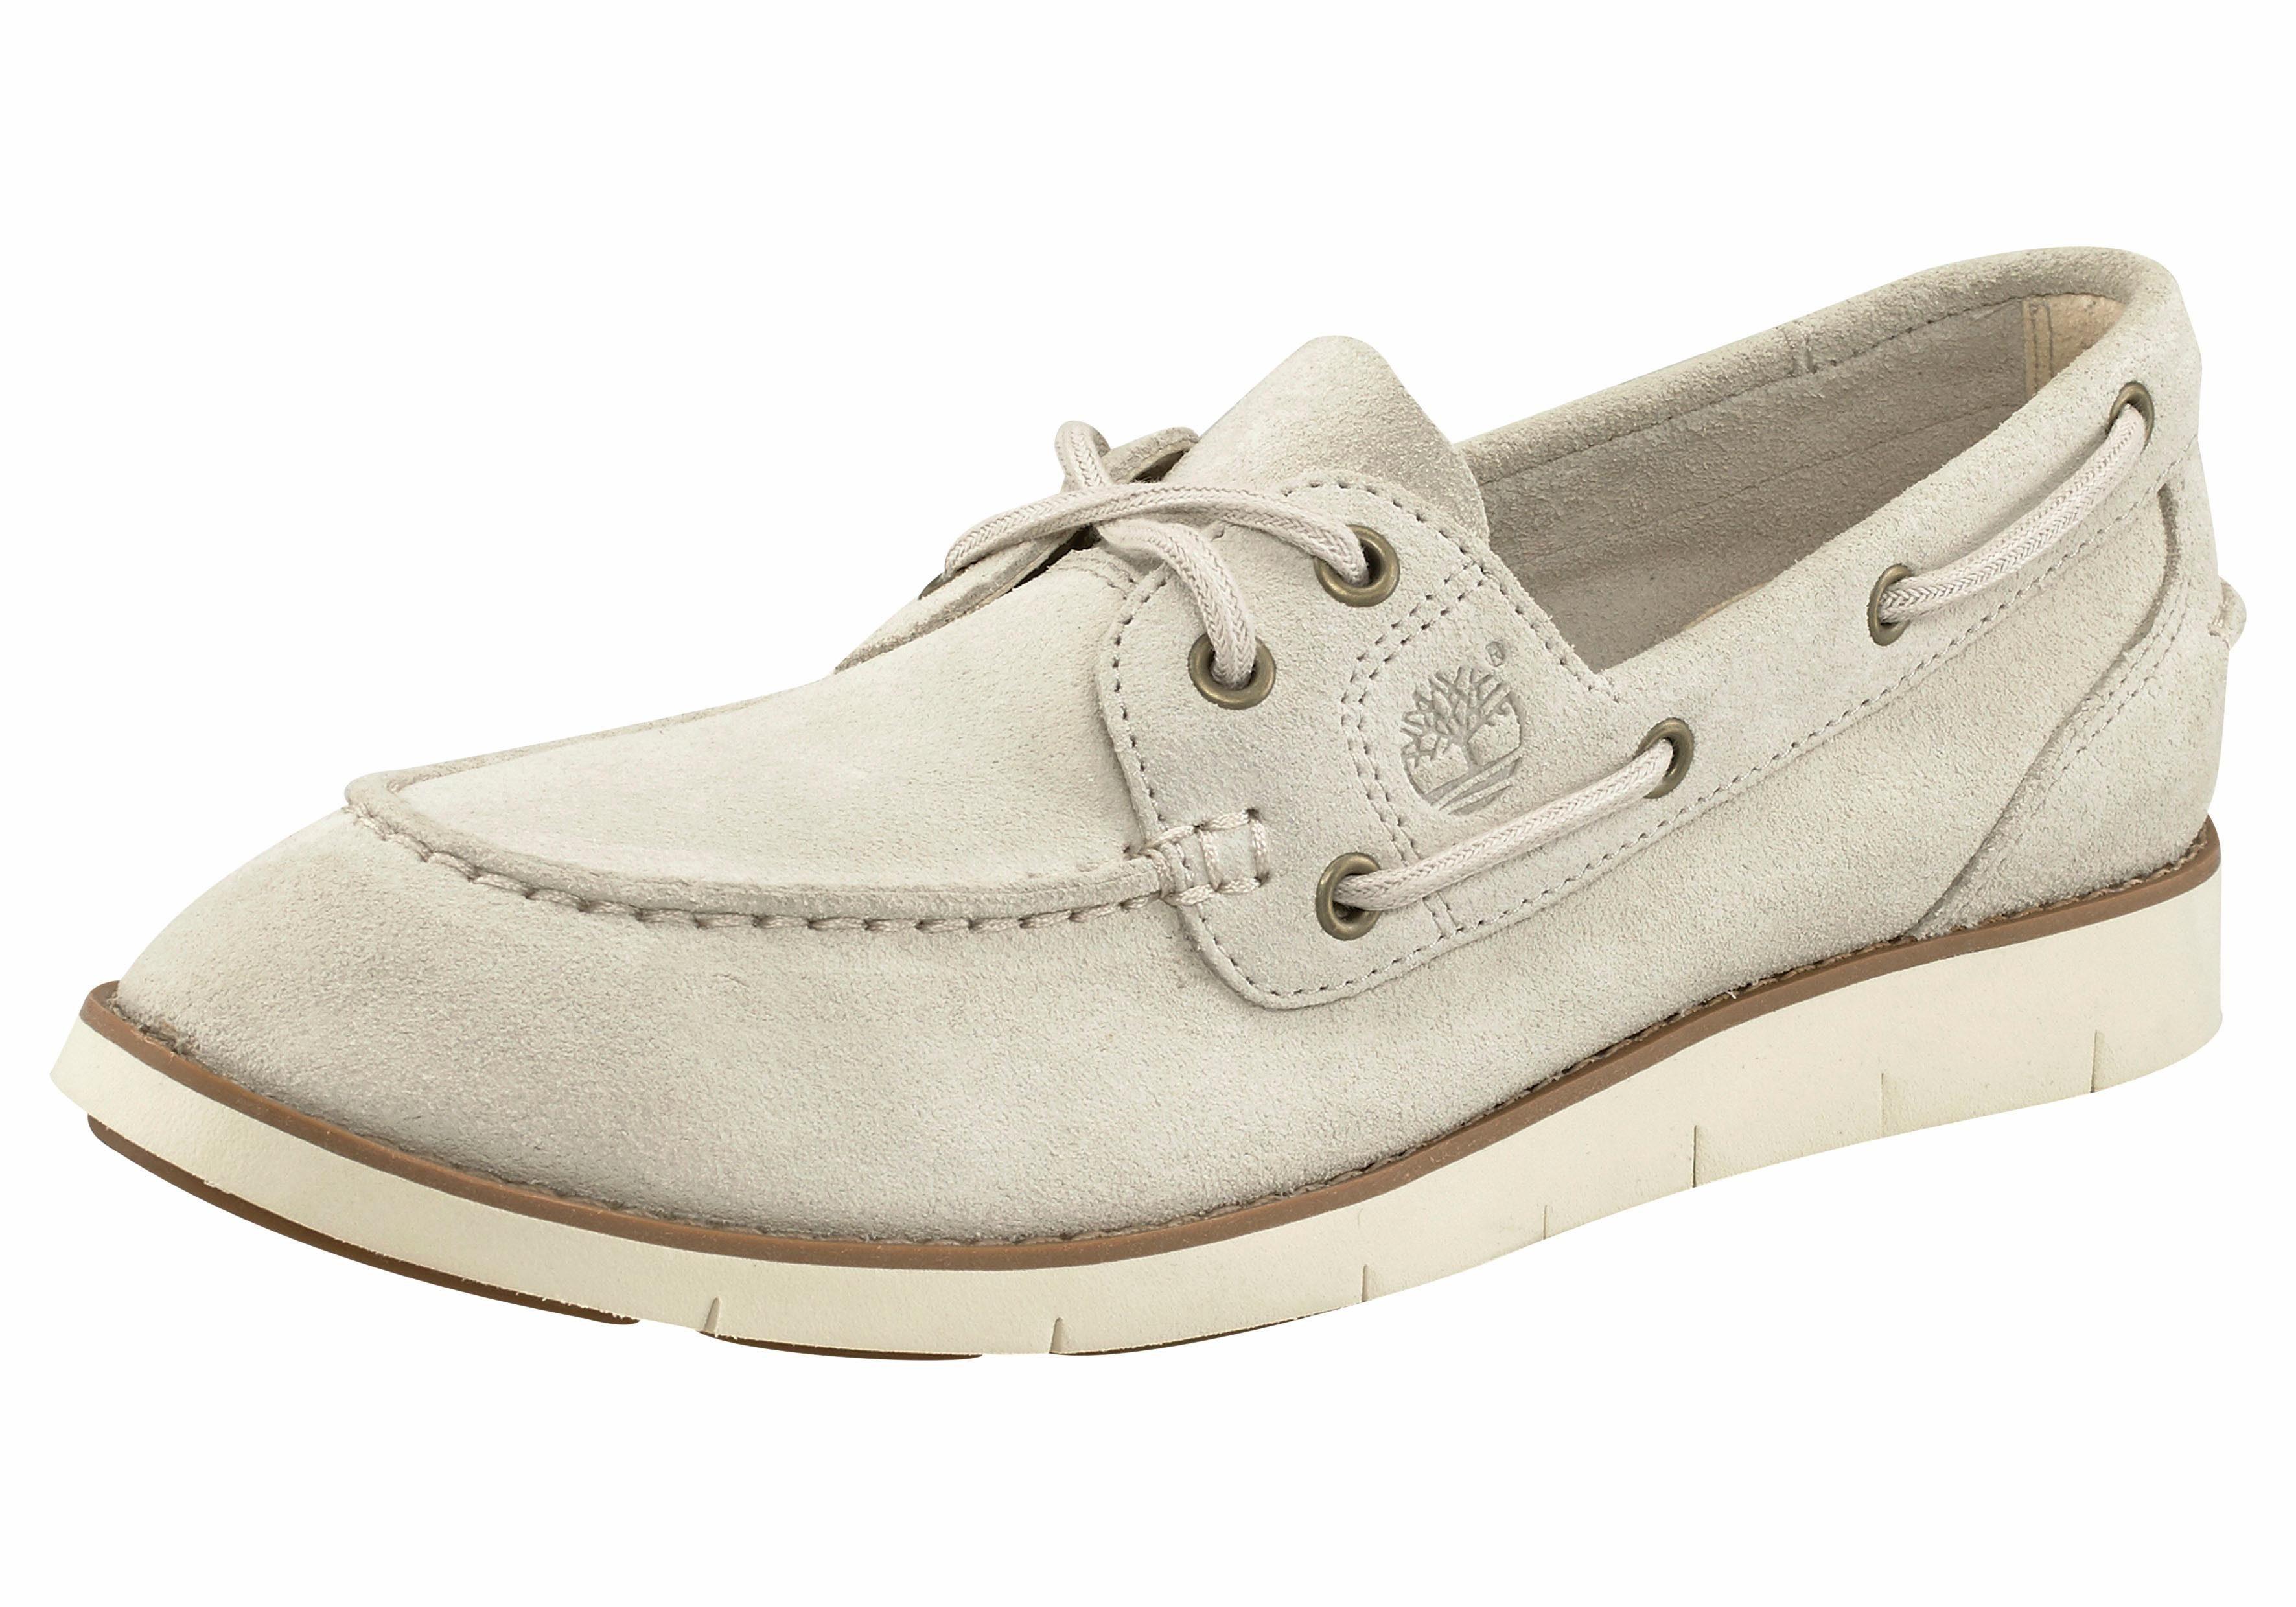 Timberland »Lakeville 2-Eye Boat Shoe« Bootsschuh, beige, 40 40